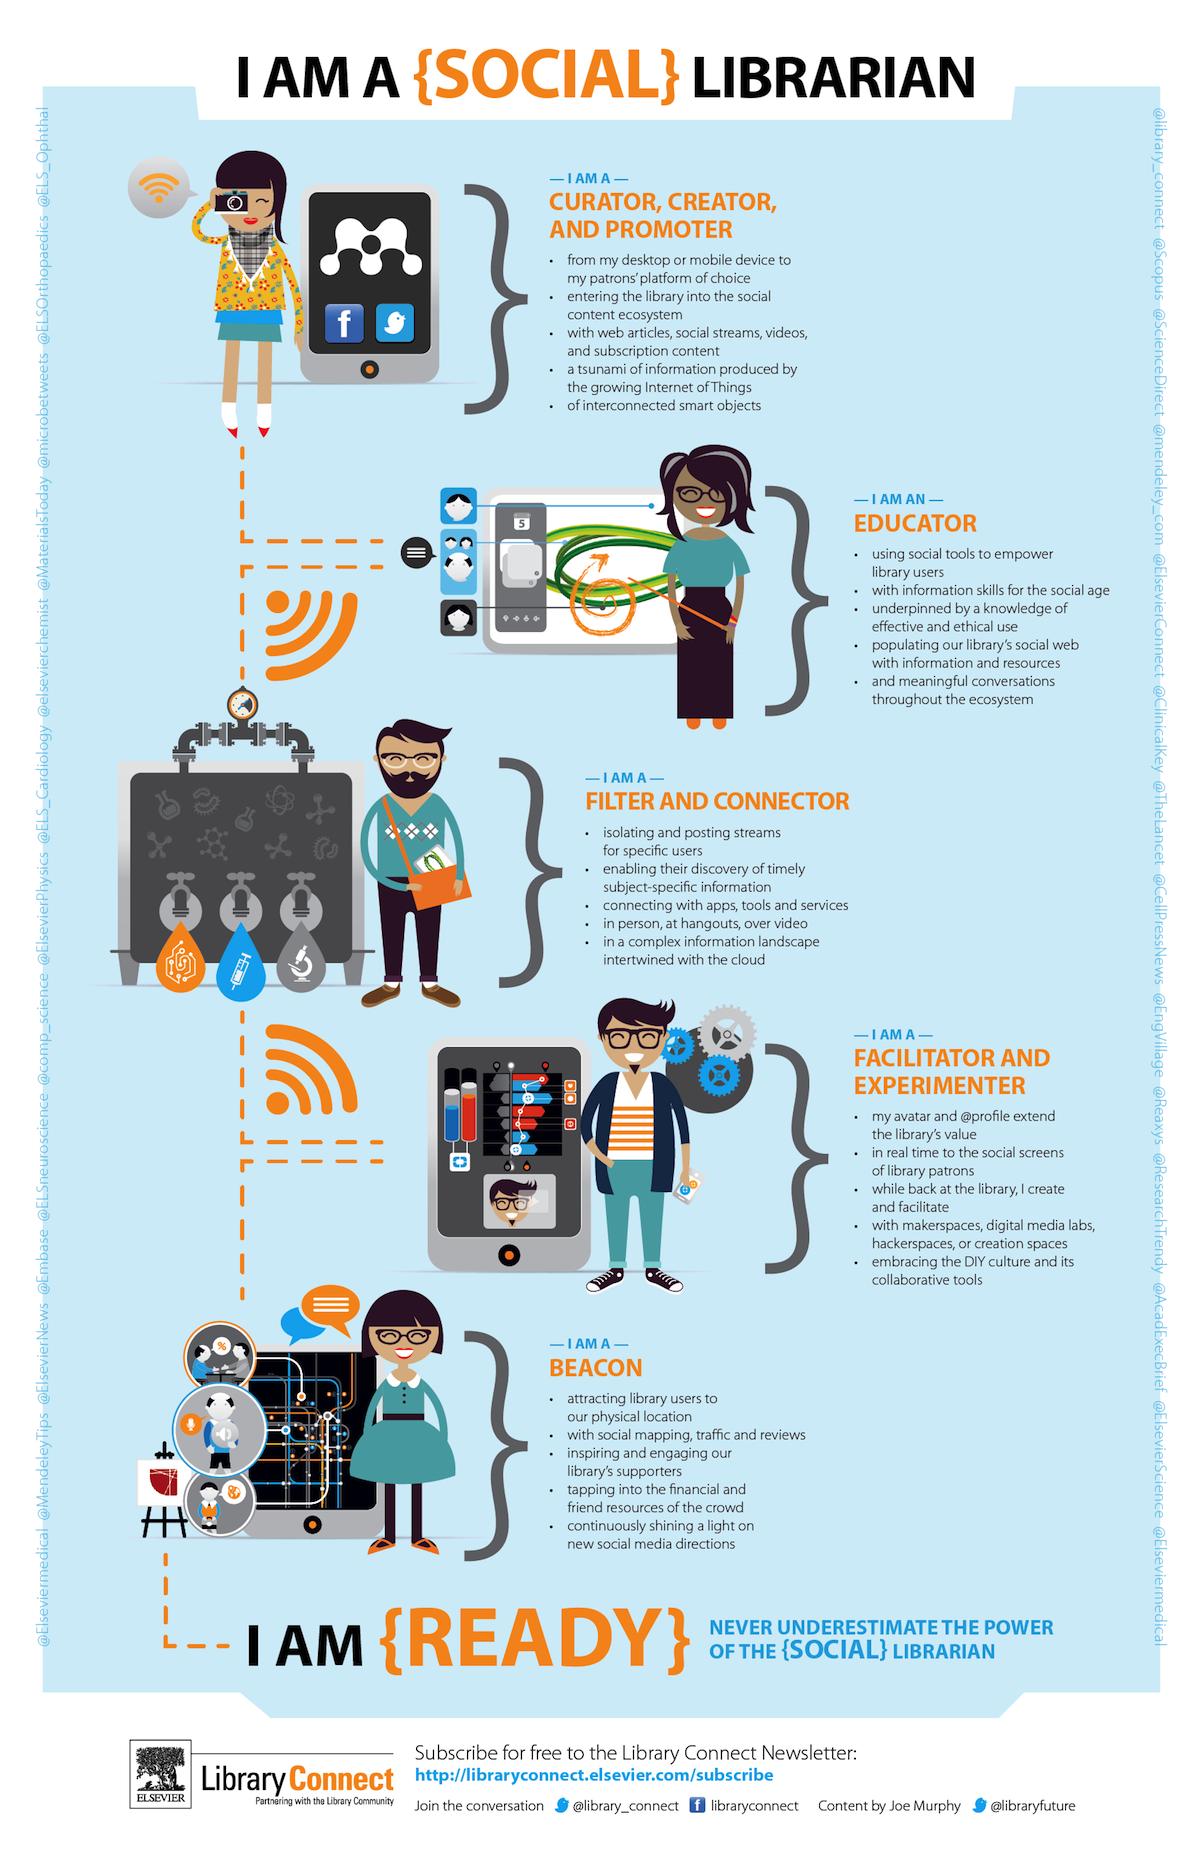 A social librarian infographic